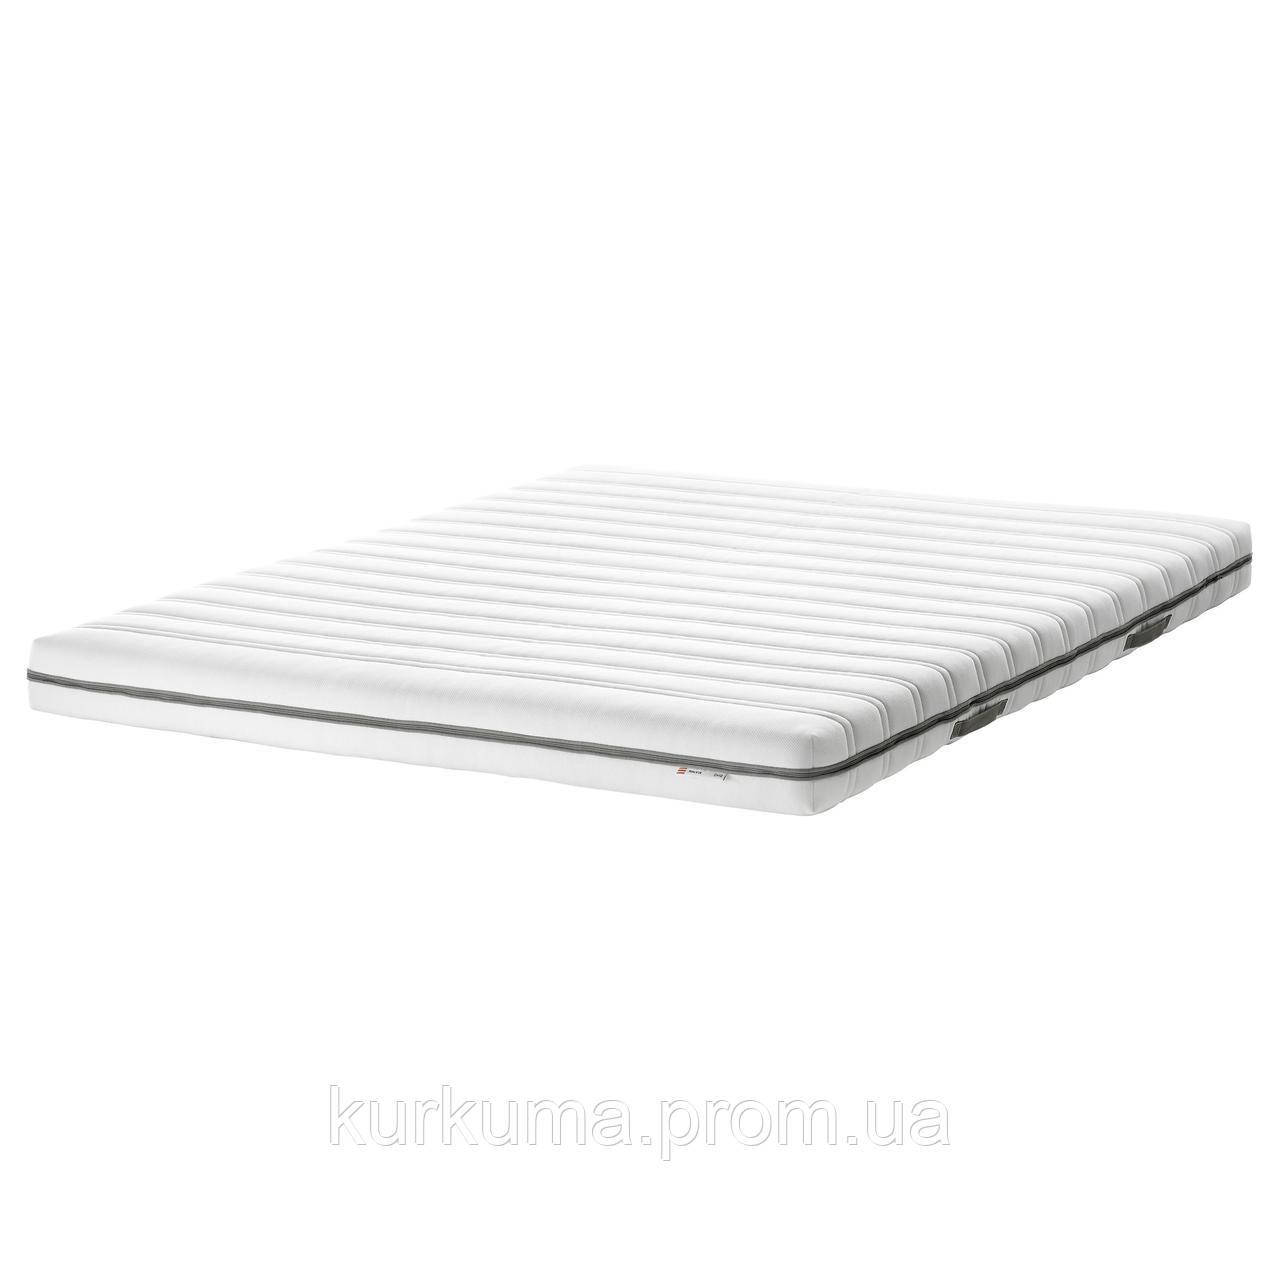 IKEA MALVIK Пенополиуретановый матрас, твердый/белый, 140х200 см (802.722.52)